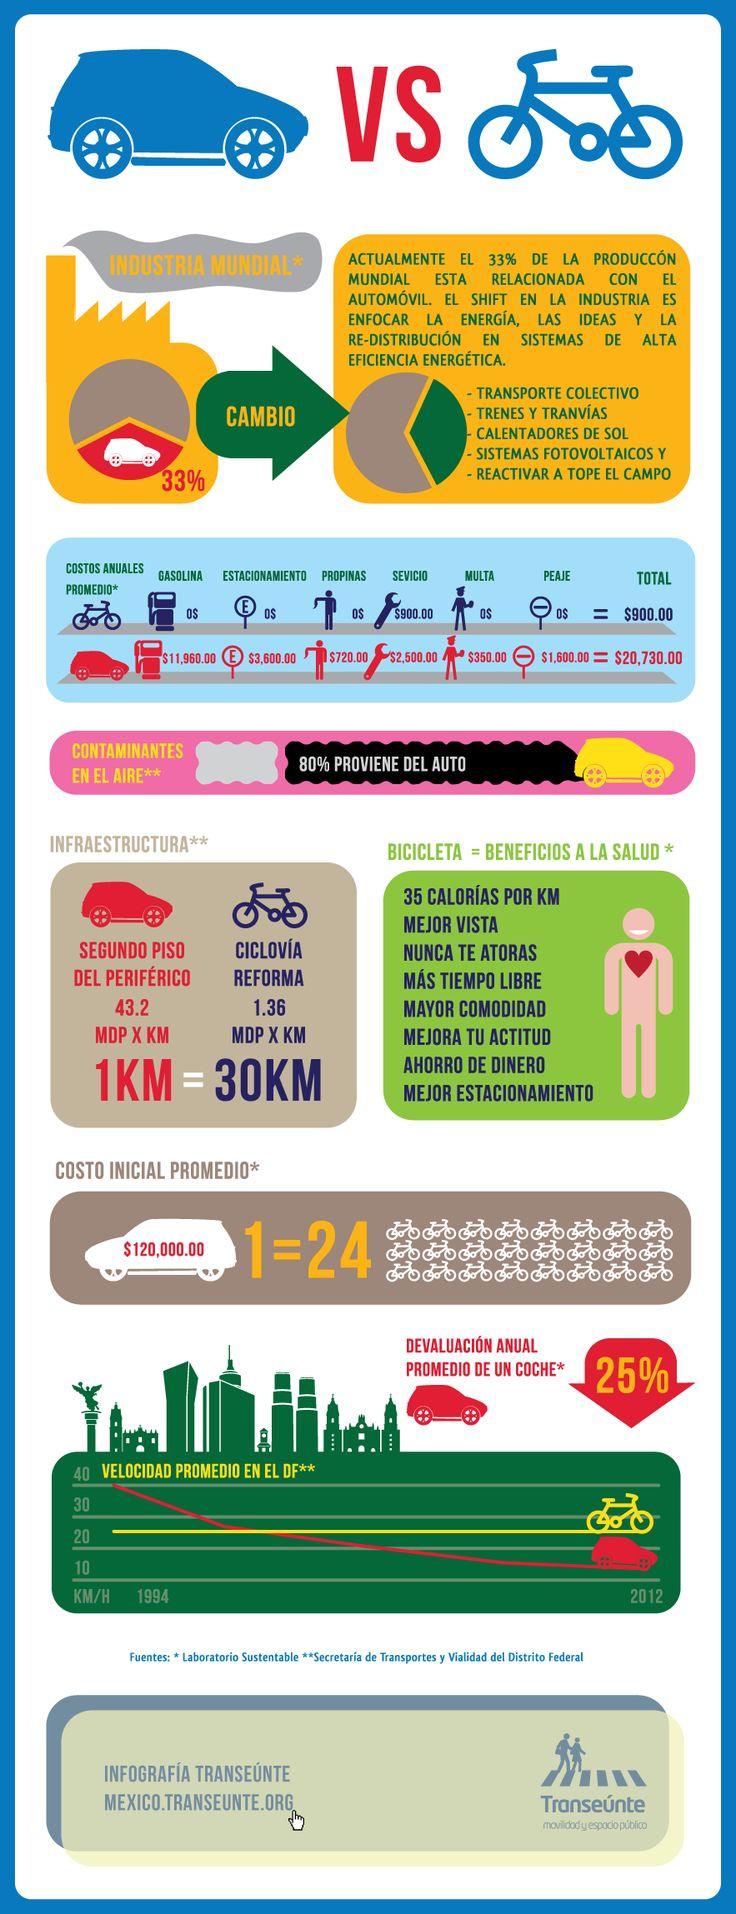 Bicicleta-Automovil(Vertical)